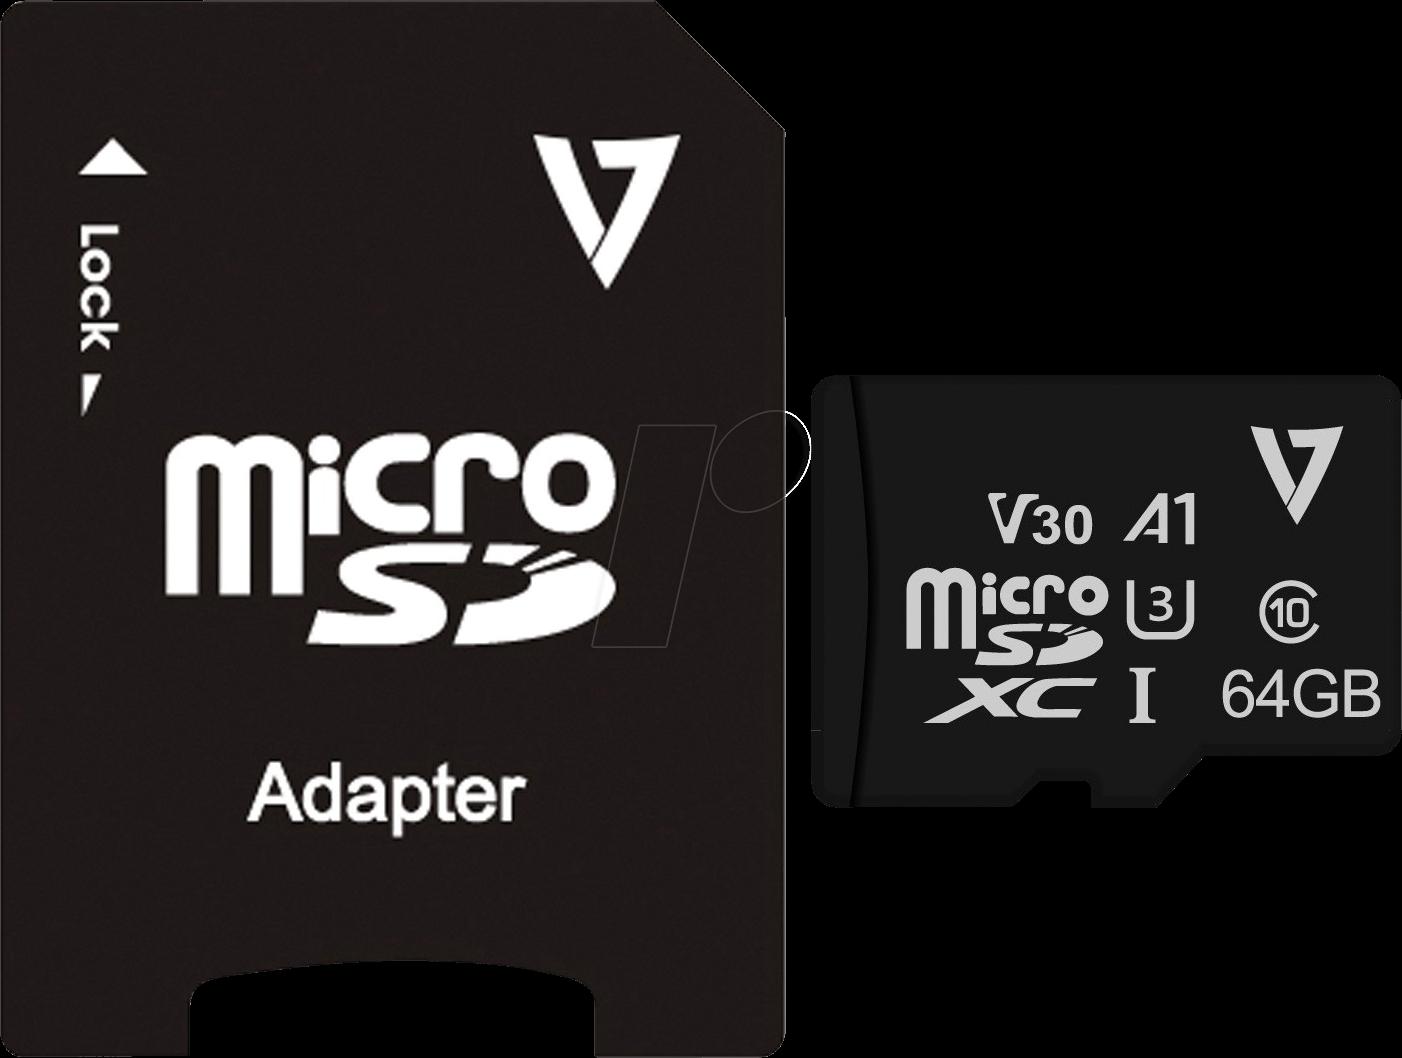 V7 VFMSD64GV30U3 - MicroSDXC-Speicherkarte 64GB, Class 10 UHS-3